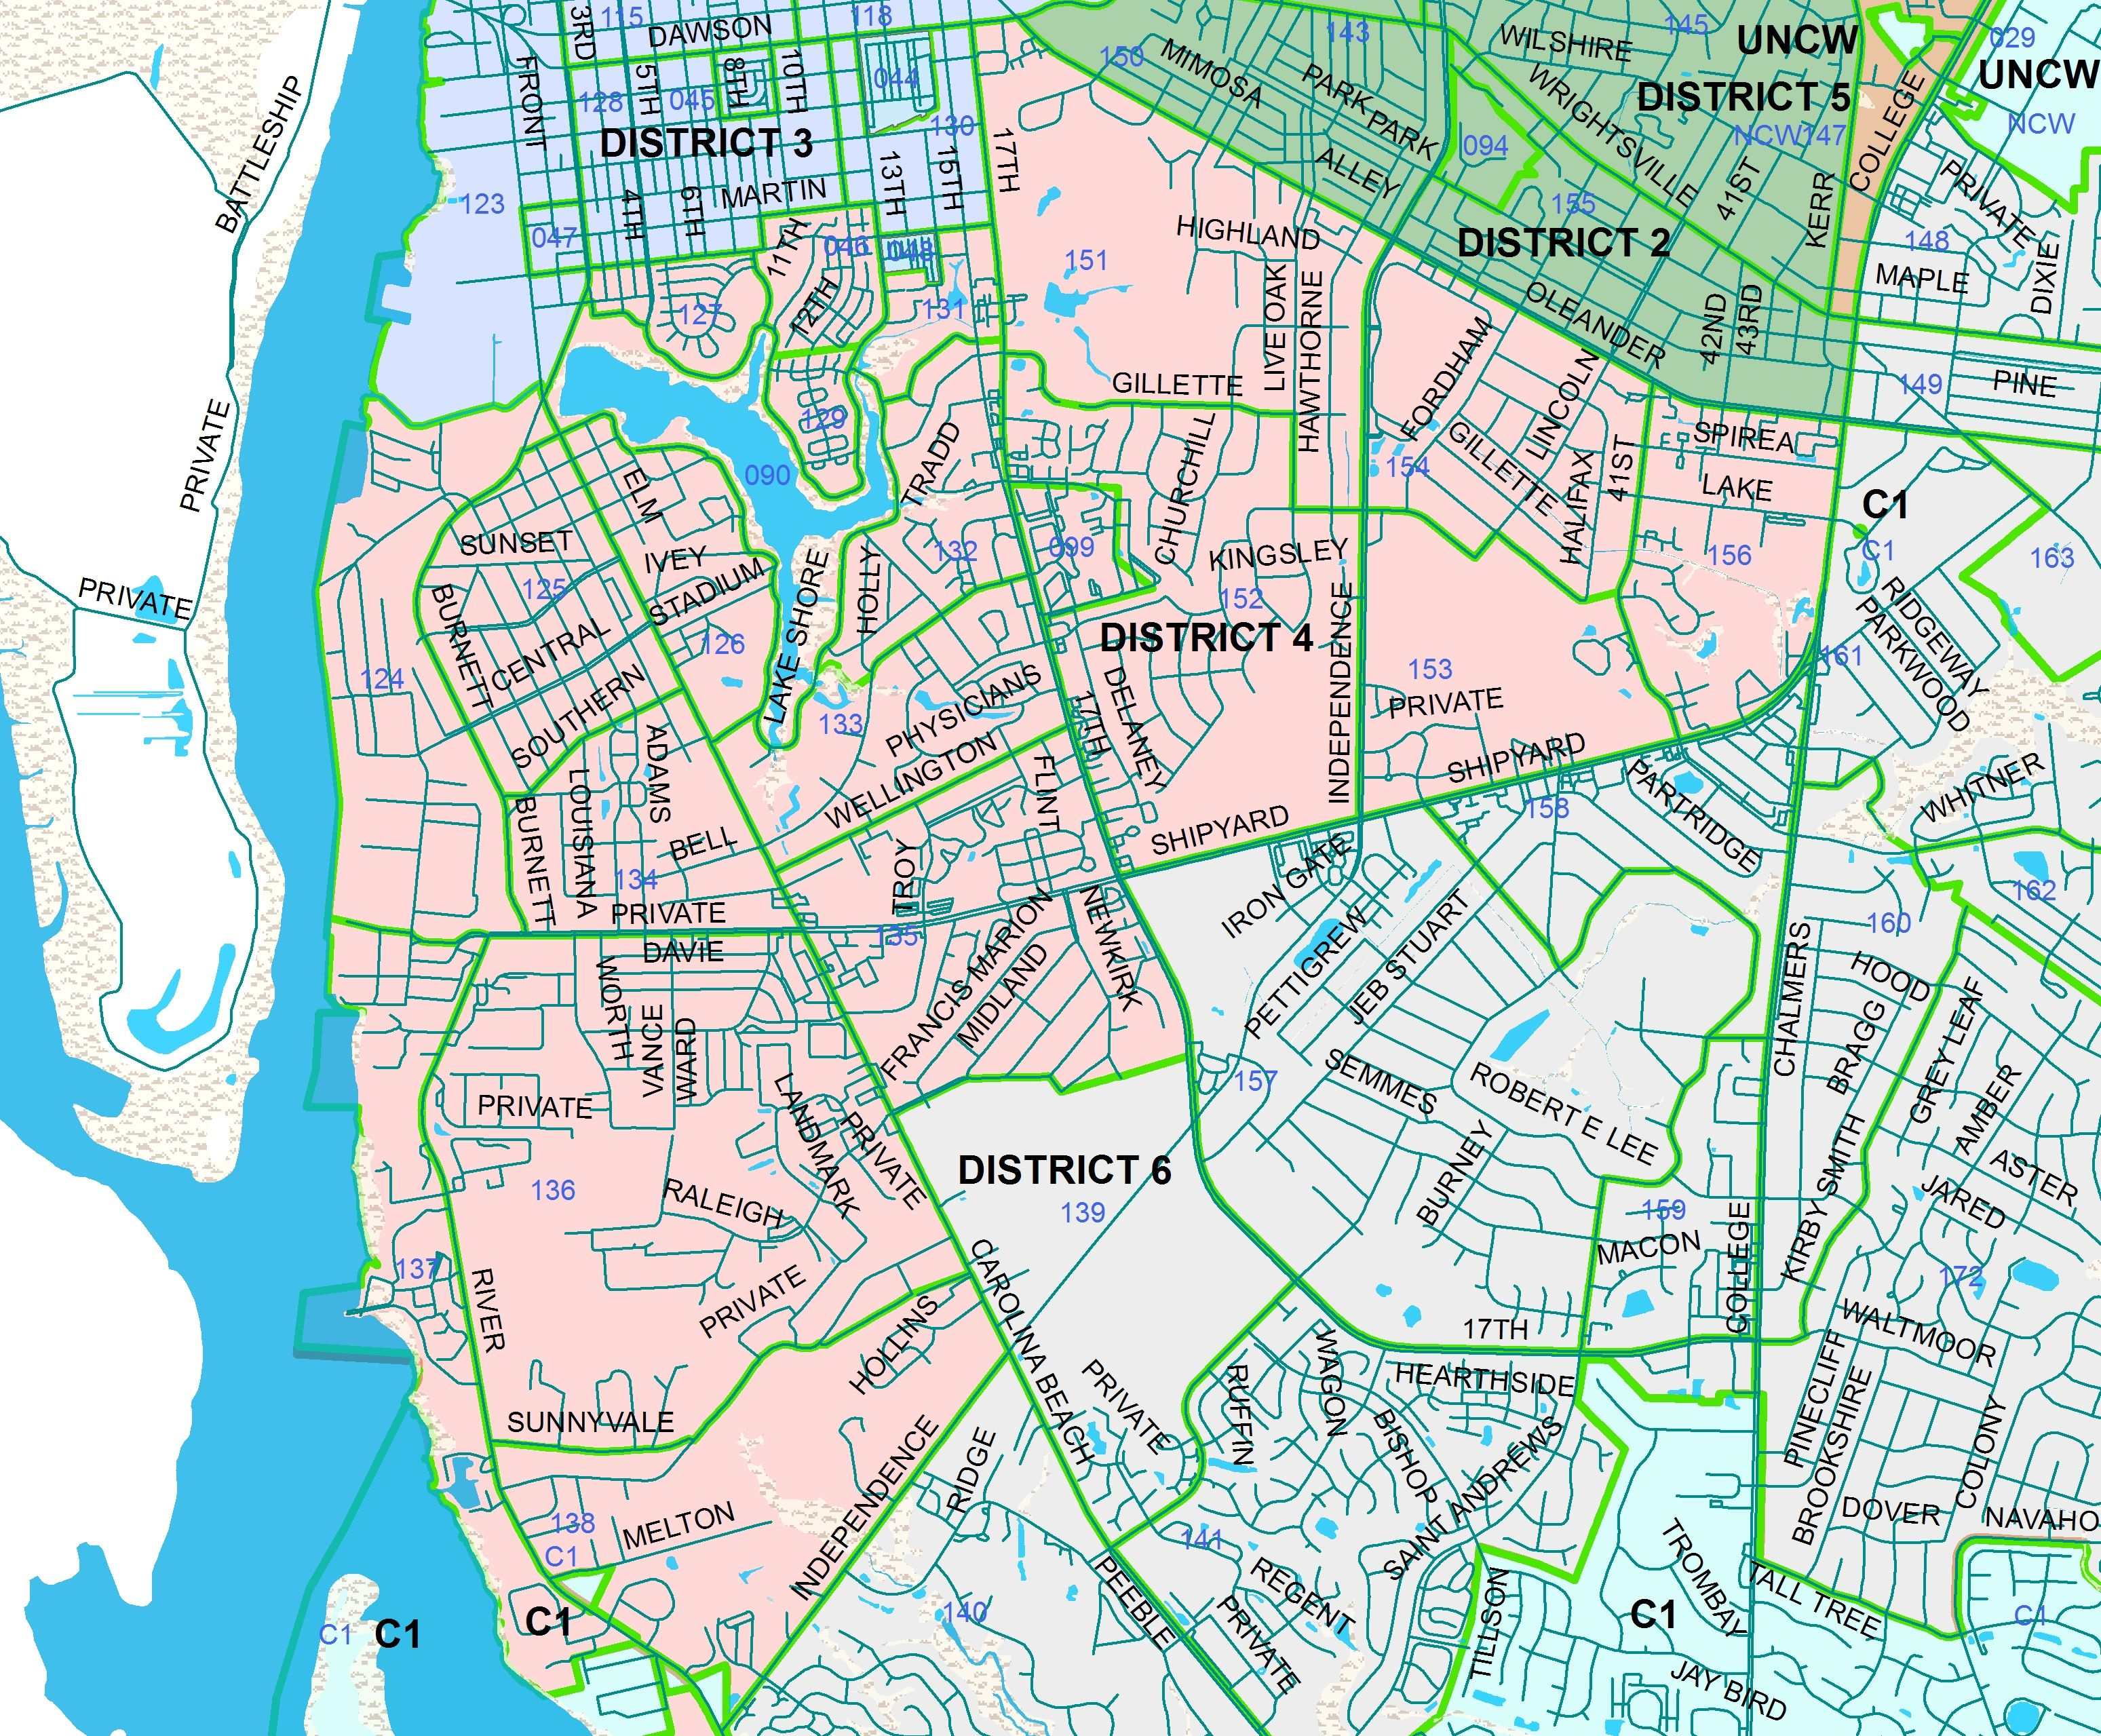 Wilmington Nc Neighborhoods Map - Google Search | N C | Wilmington - Printable Map Of Wilmington Nc